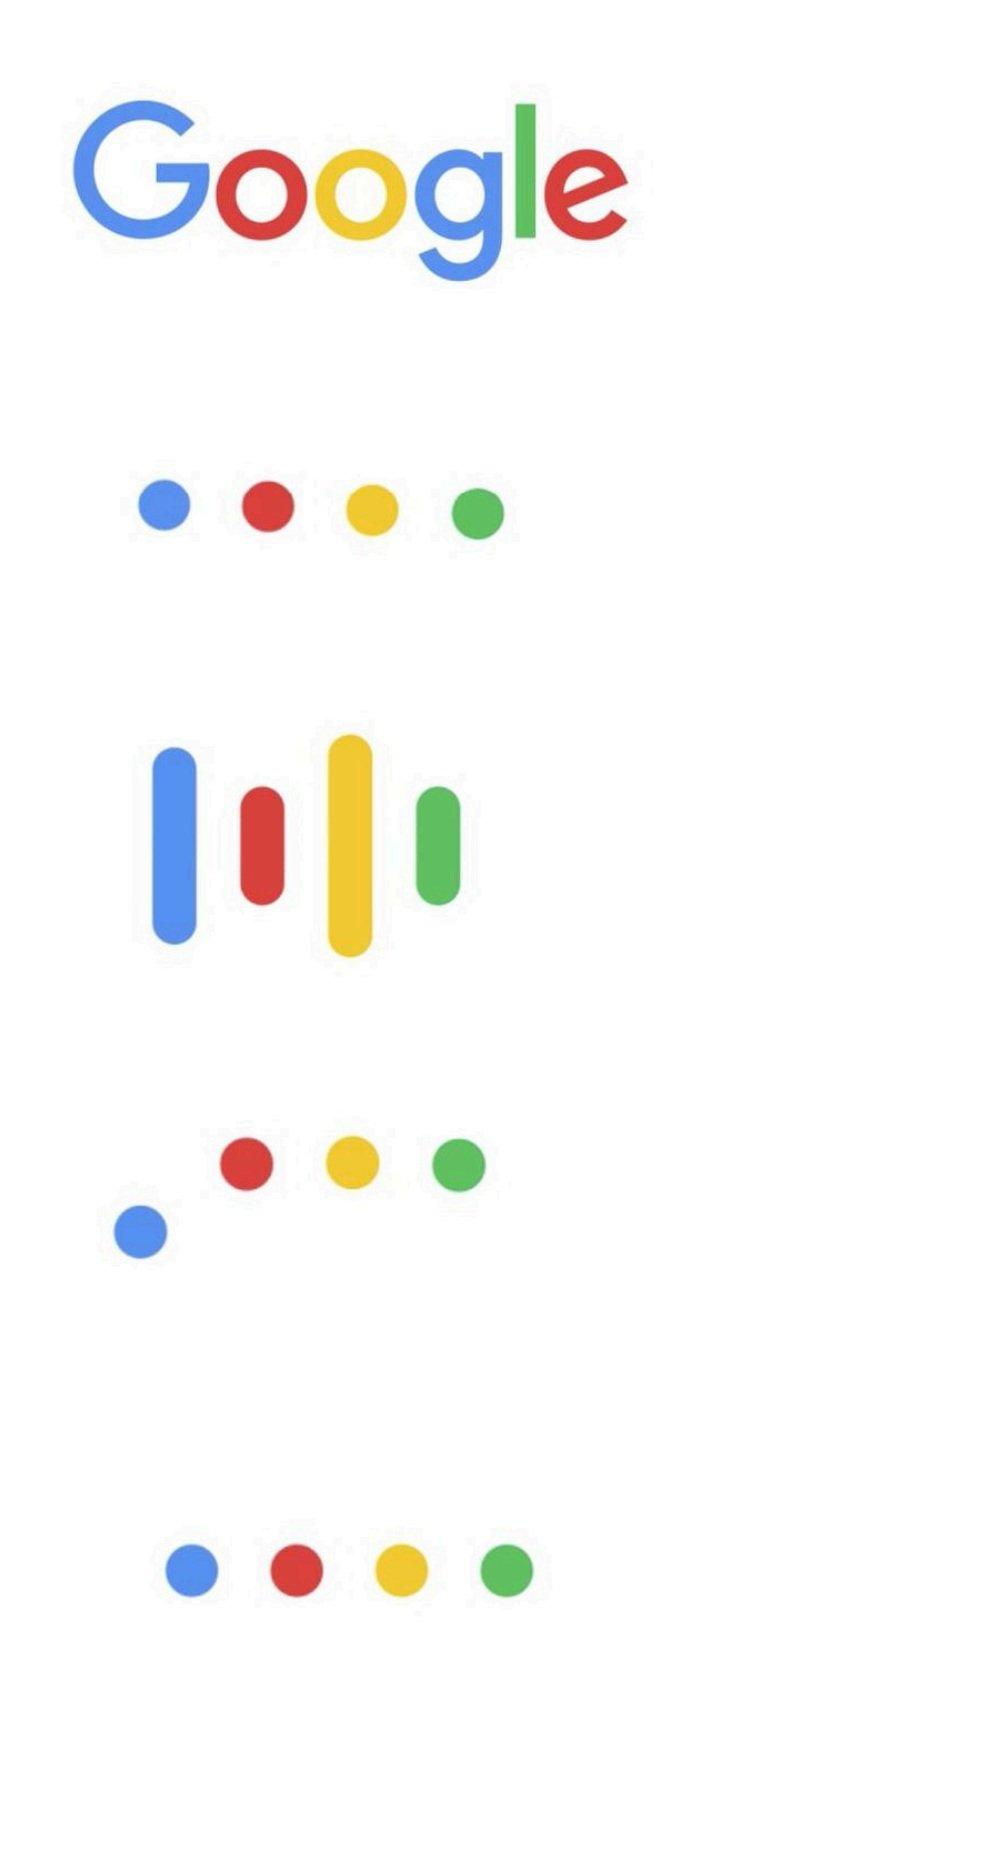 Google Trademark Application